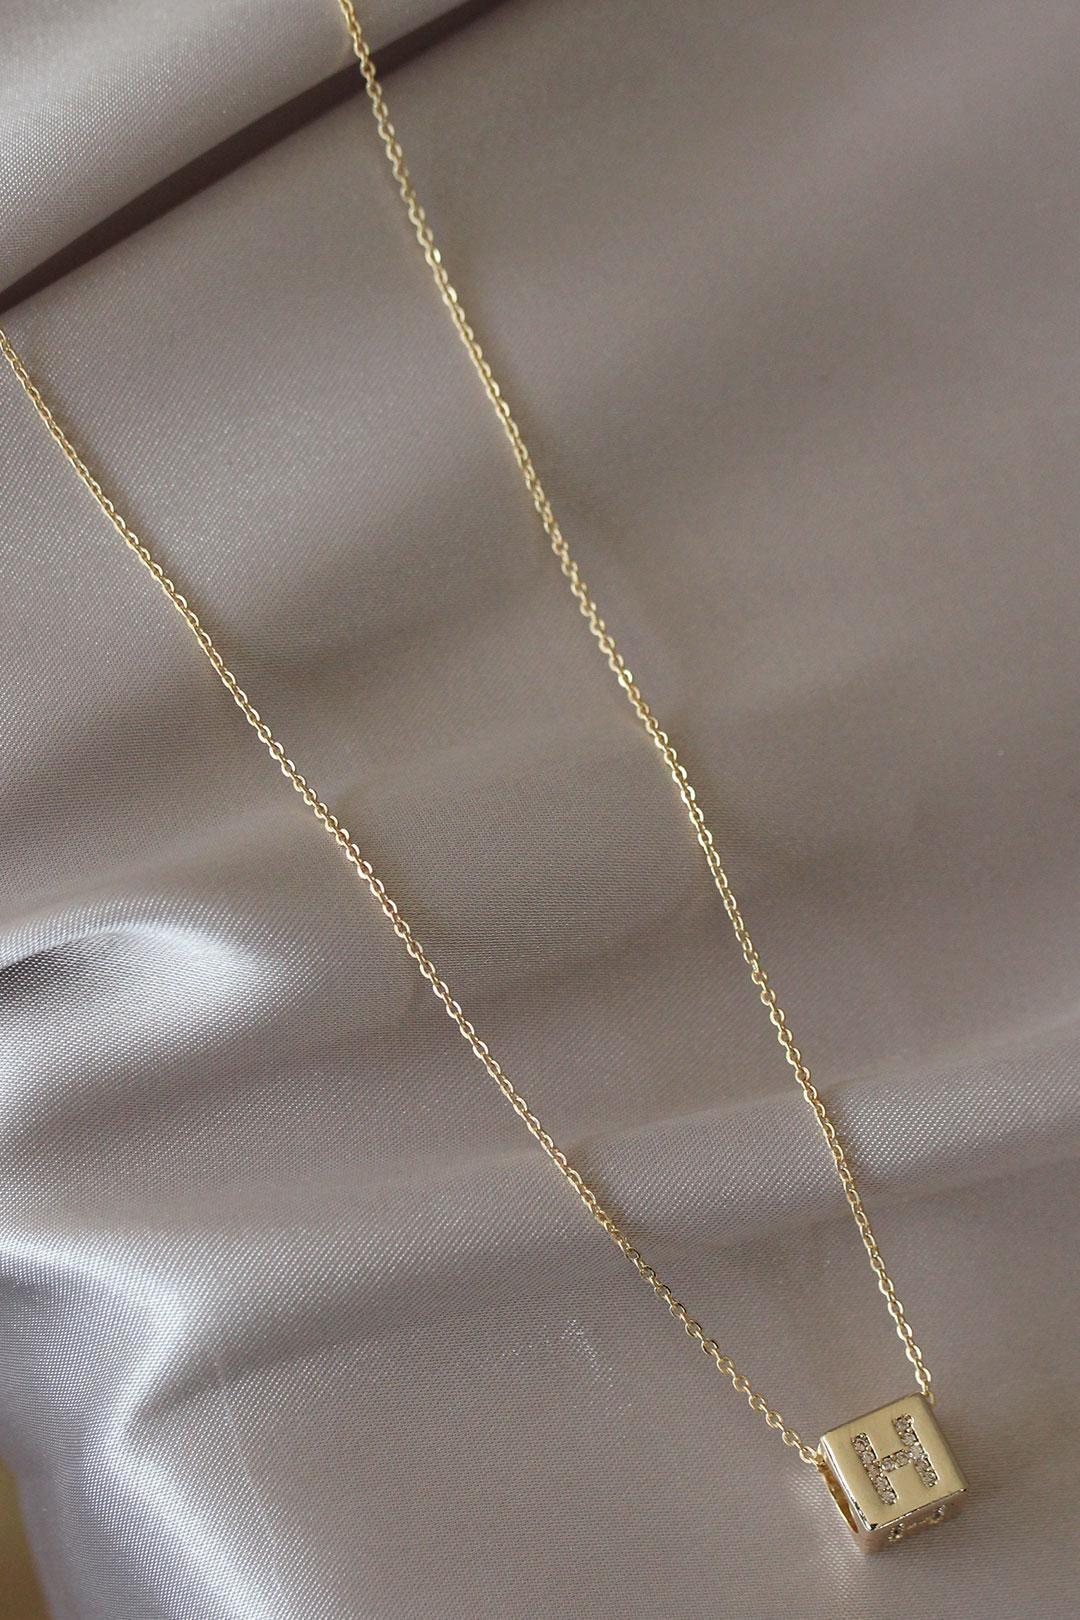 Küp Model Gold Renk Zirkon Taşlı H Harfli Kolye